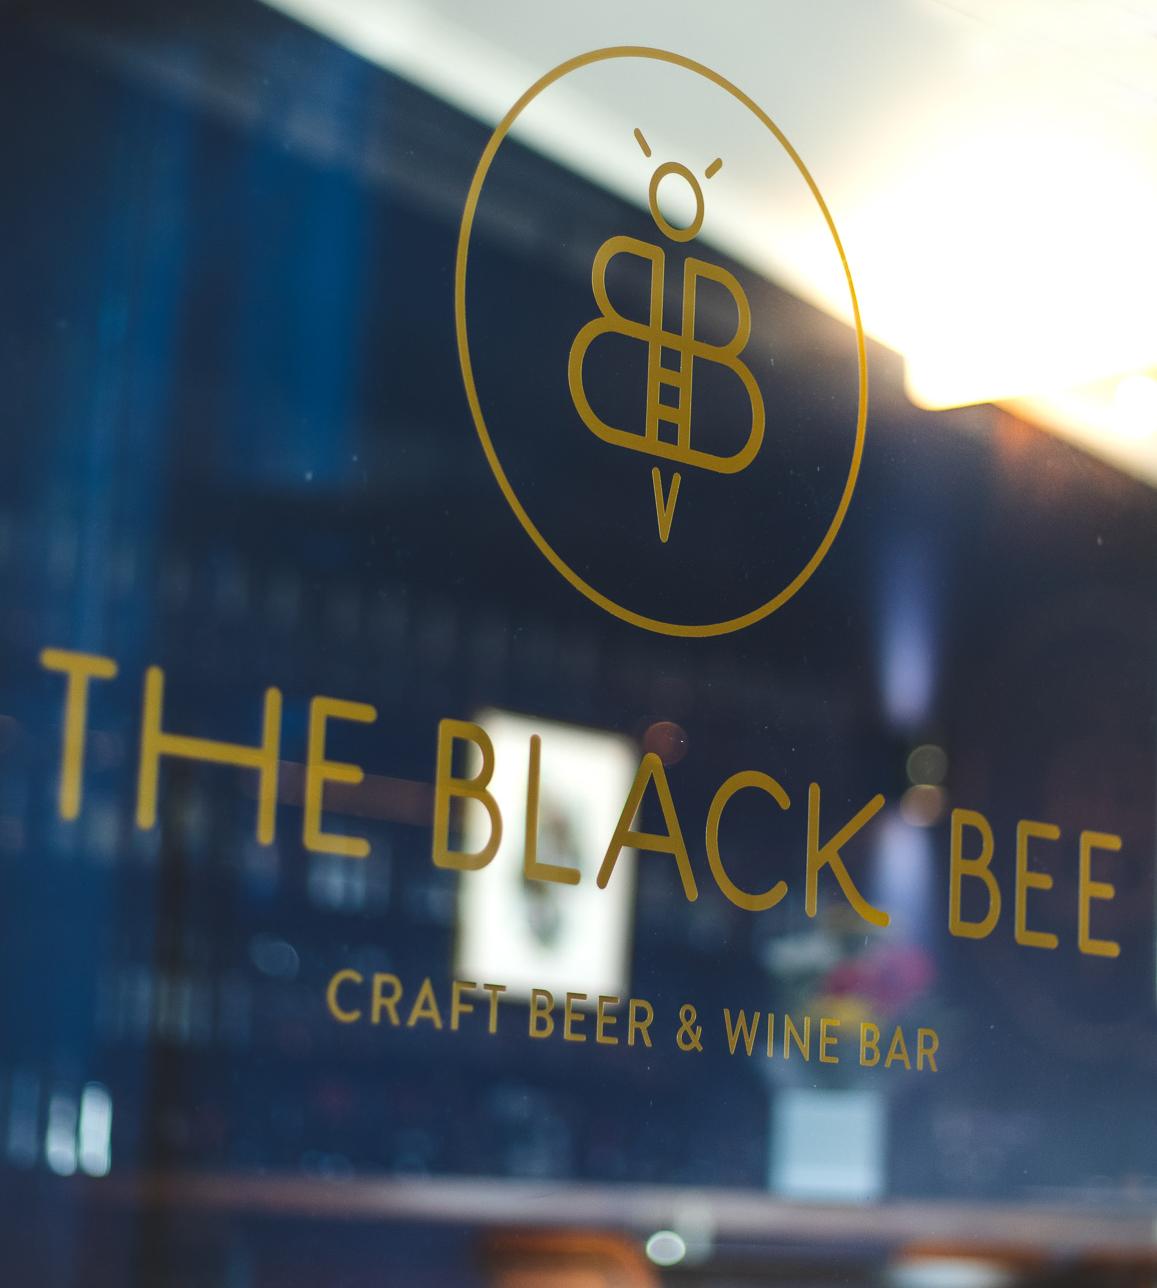 Studio-Mimi-Moon-Brand-Identity-The-Black-Bee-Wine-Bar-